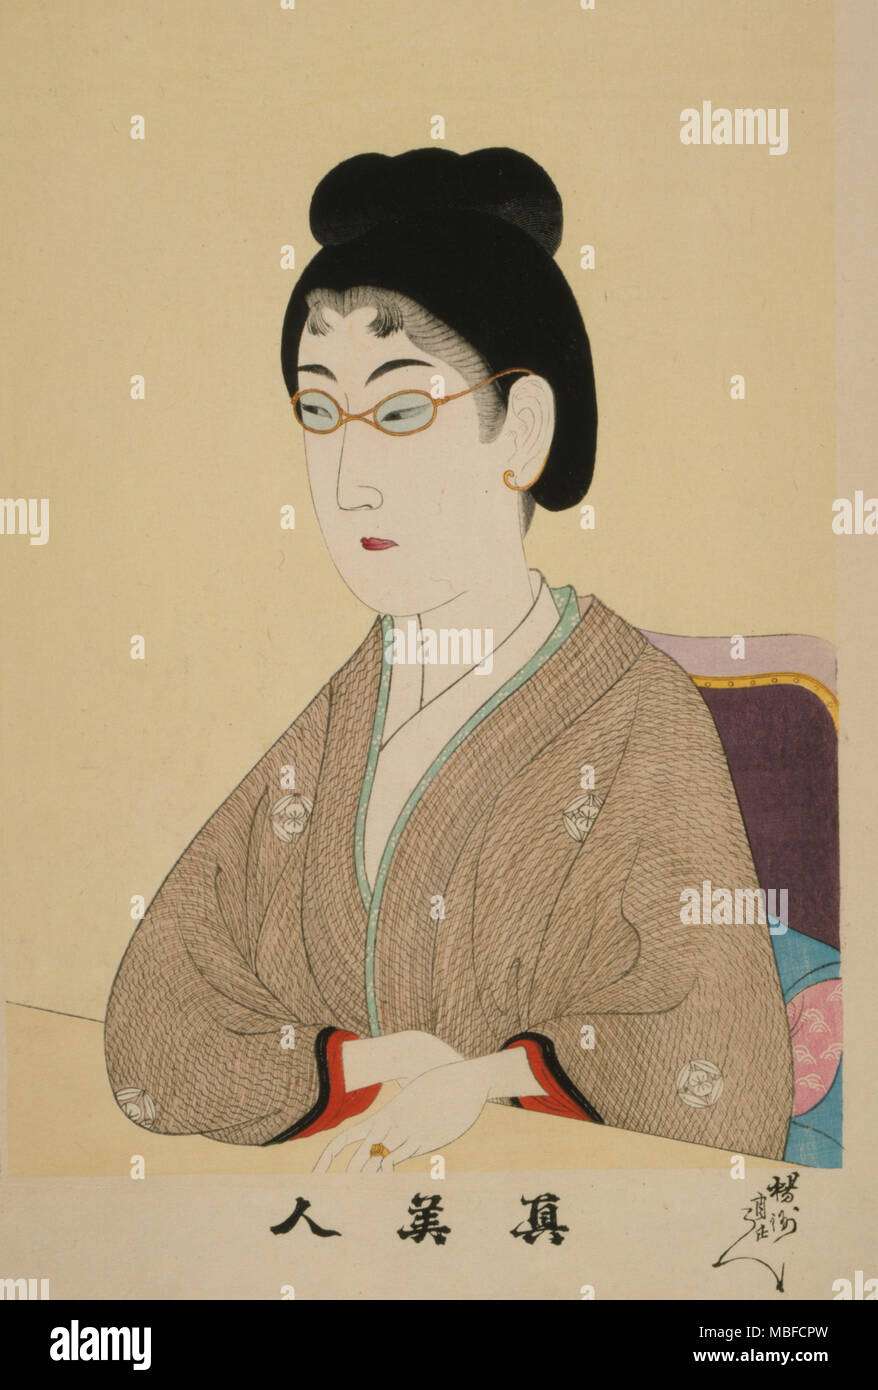 Japanese Professional Woman - Stock Image